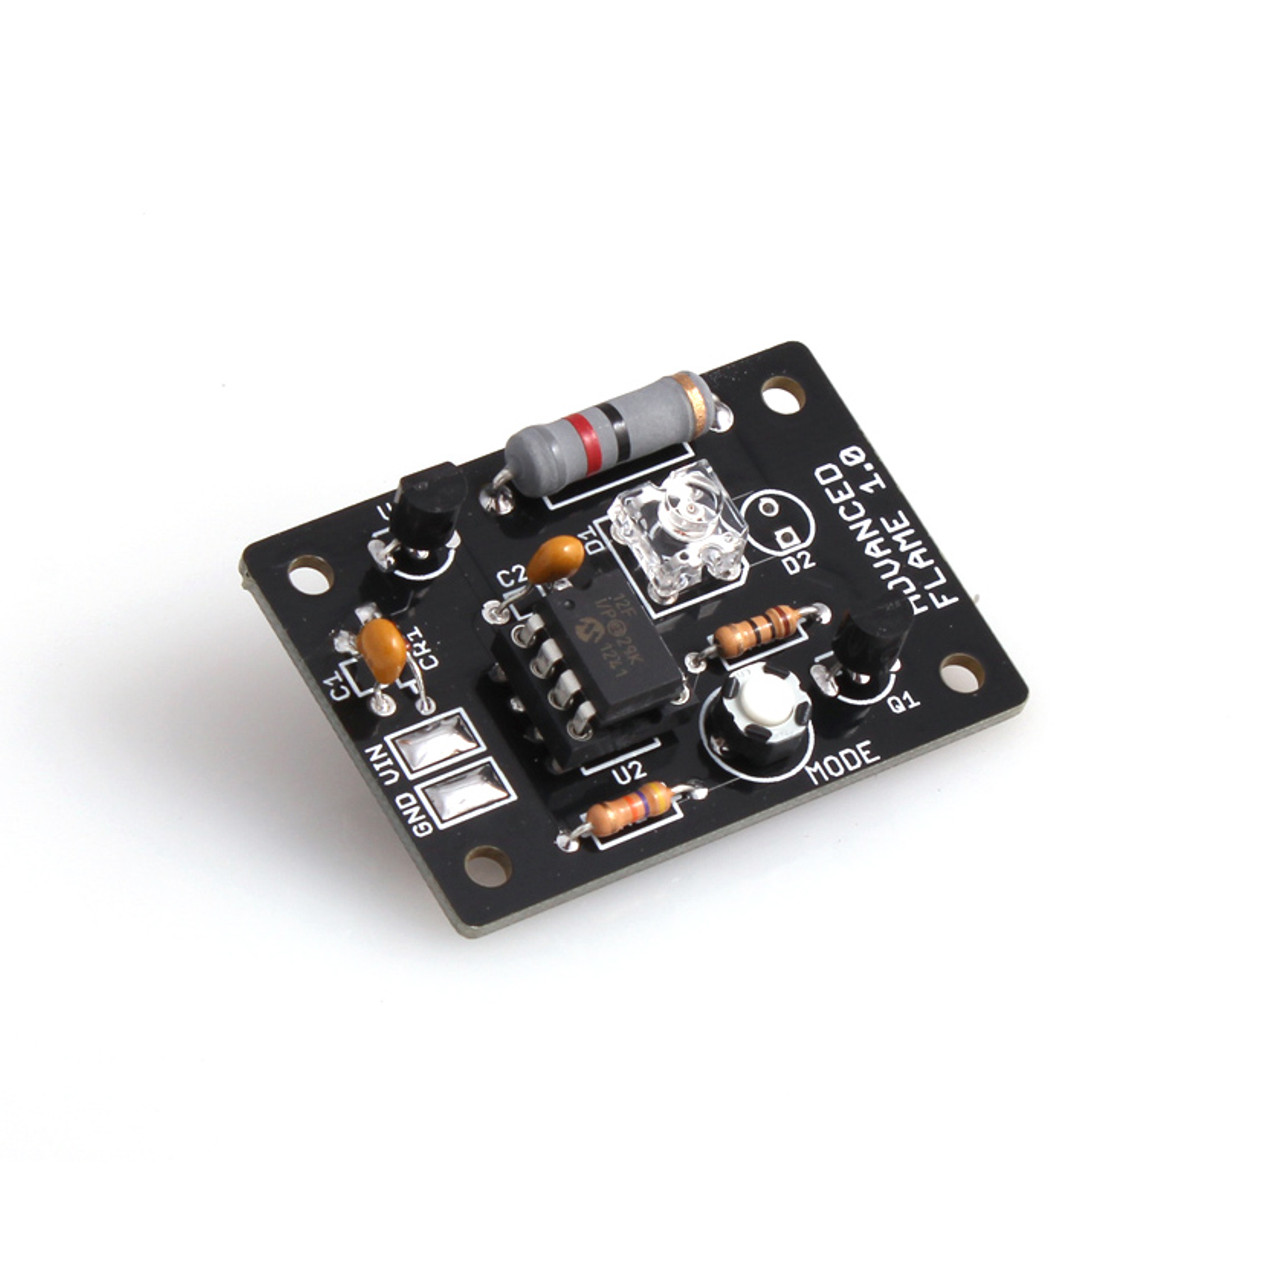 Advanced Flame 1.0 LED Kit